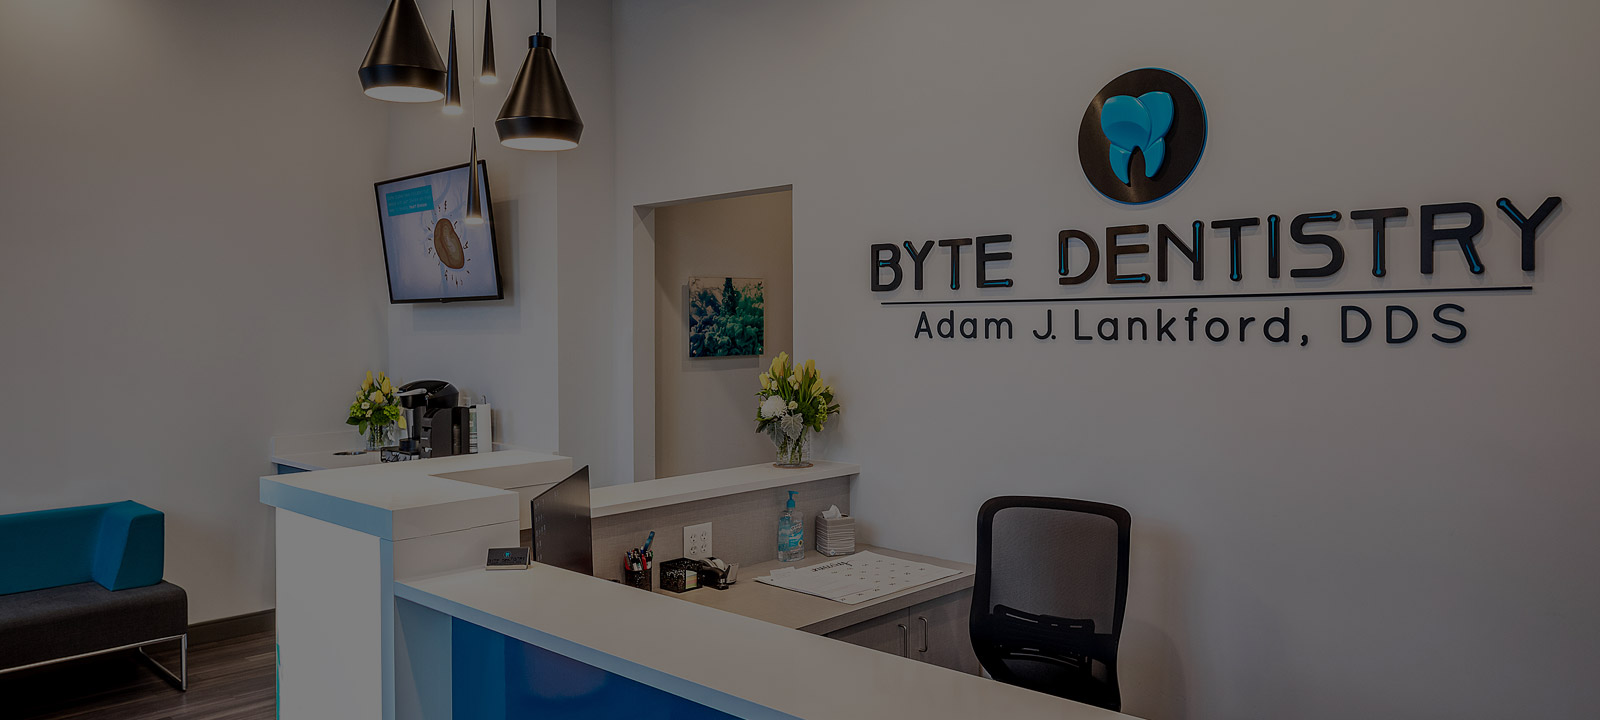 Byte Dentistry reception area